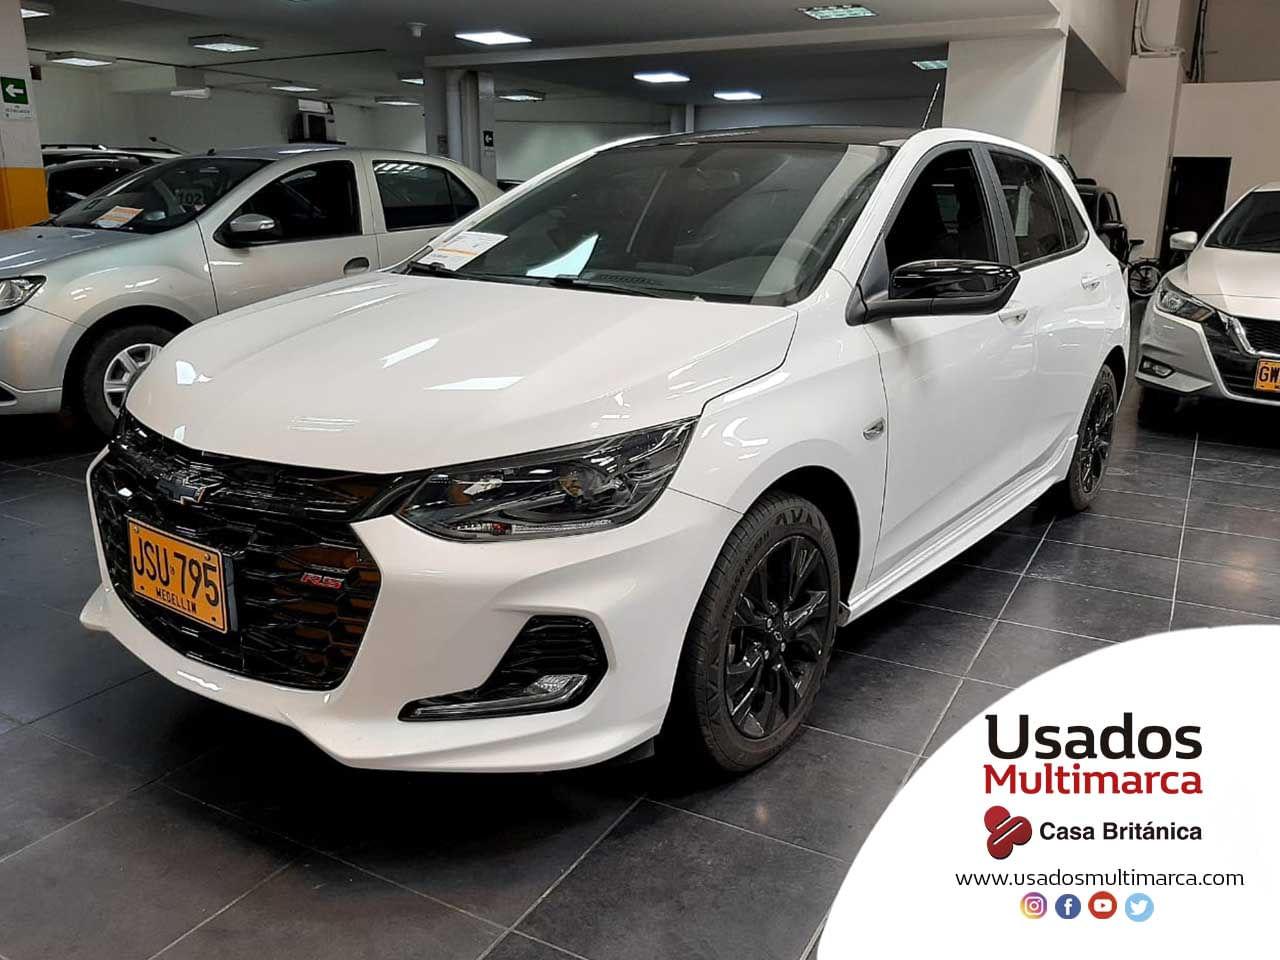 Chevrolet-Onix-Rs-01483793-1